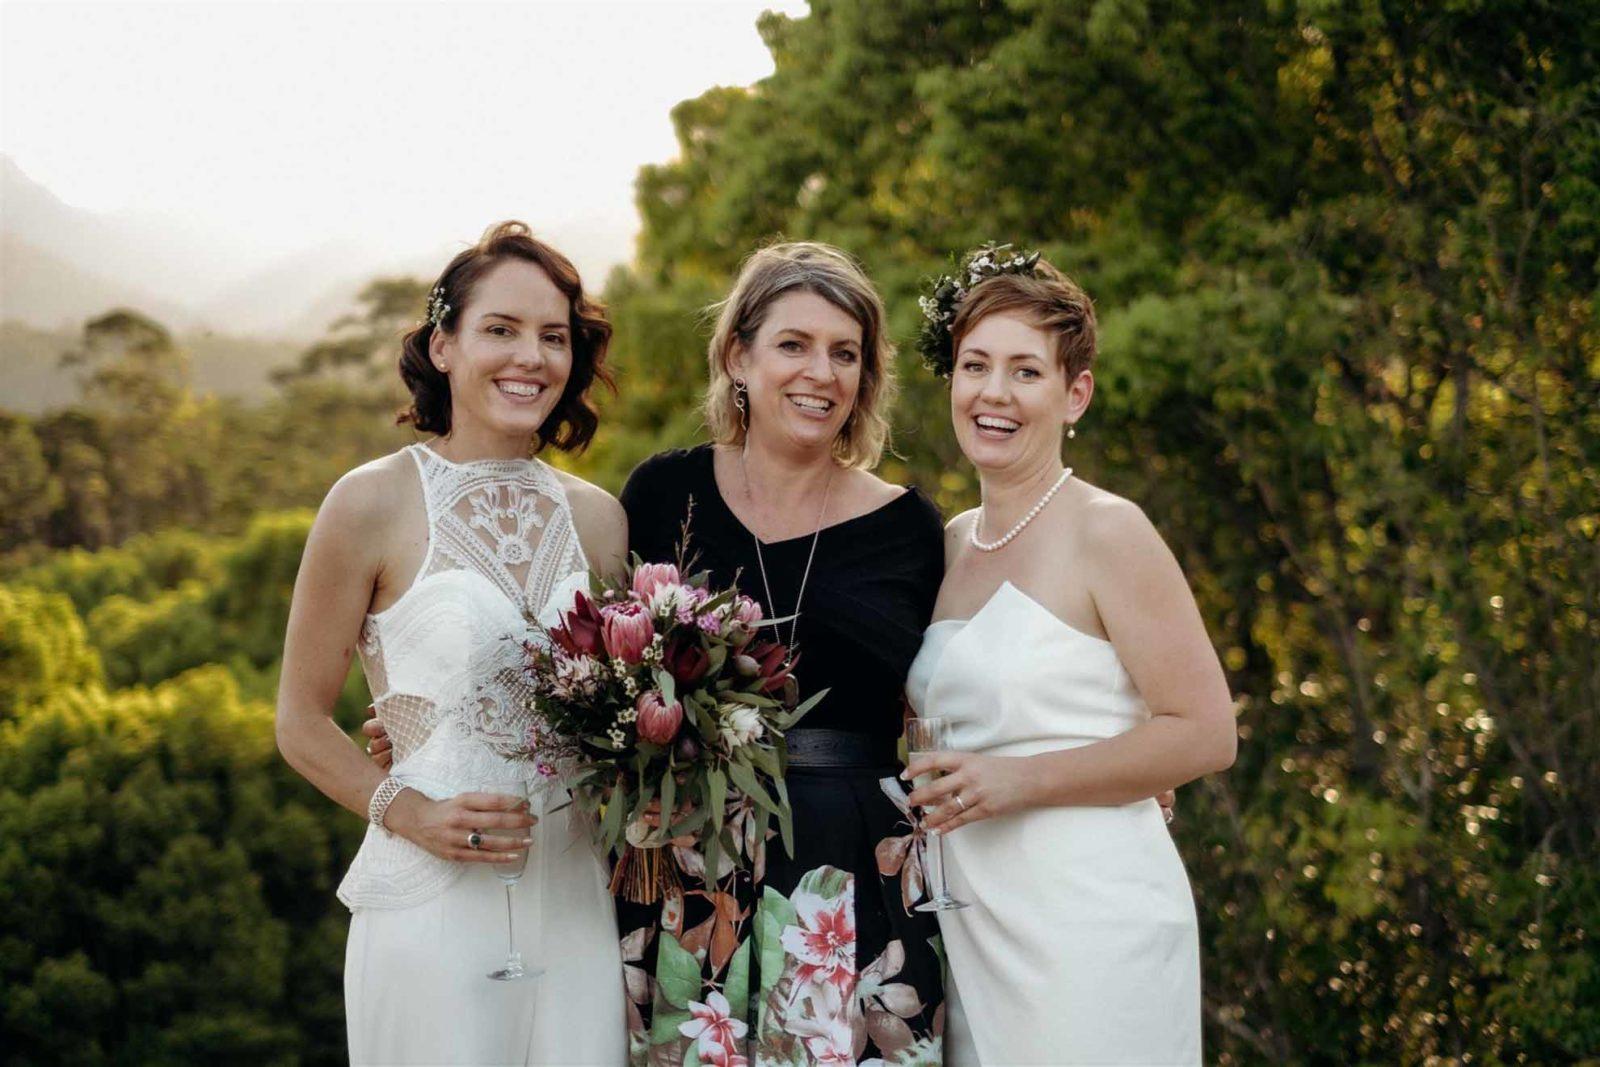 Roxy Hotten - Celebrant lesbian gay same-sex lgbt couple wedding marriage Brisbane Queensland Australia Dancing With Her online directory magazine (1)